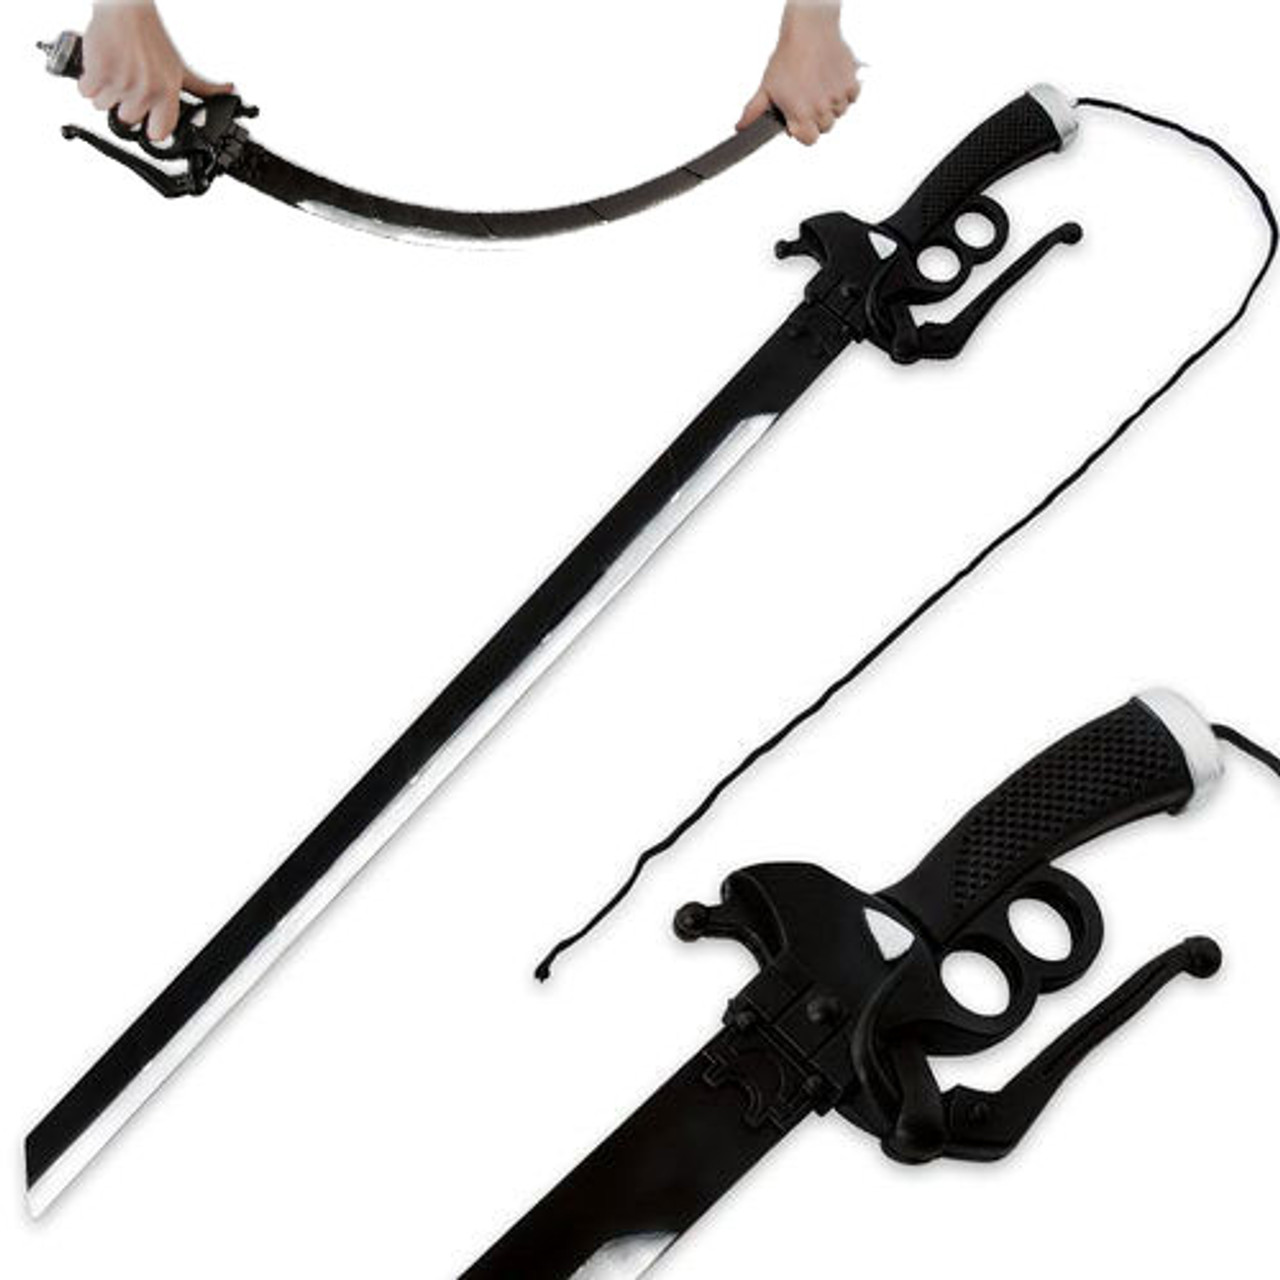 Special Operations Foam Titan Attack Gaming Costume Play Eren Sword